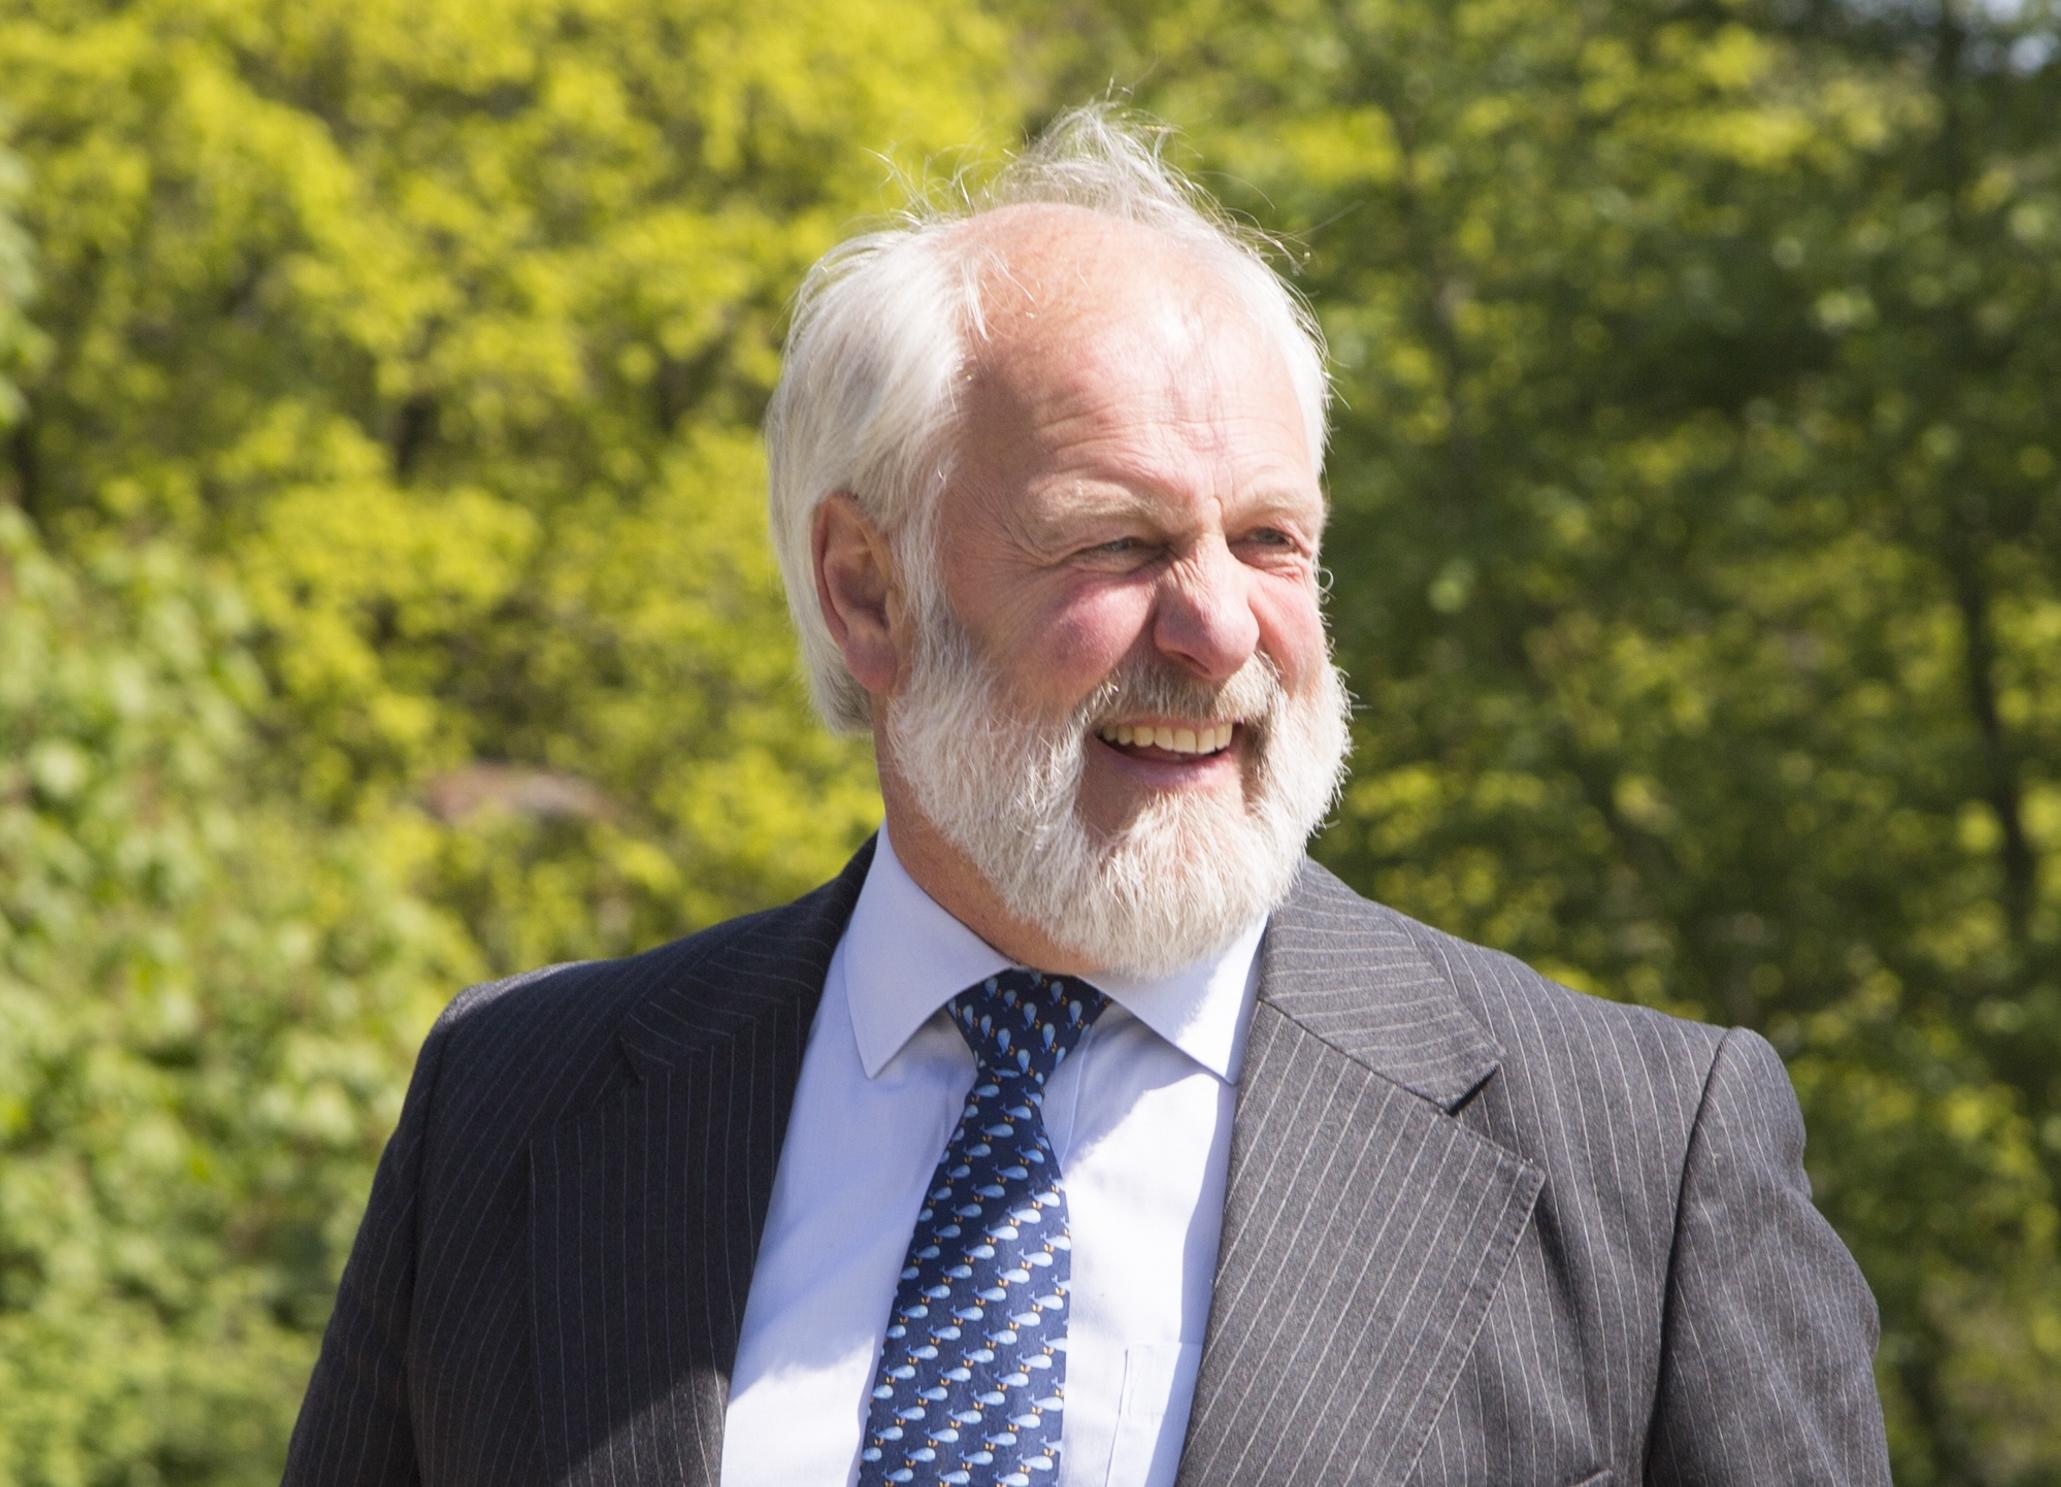 Chris King - Owner / Director of King Marine Ltd.